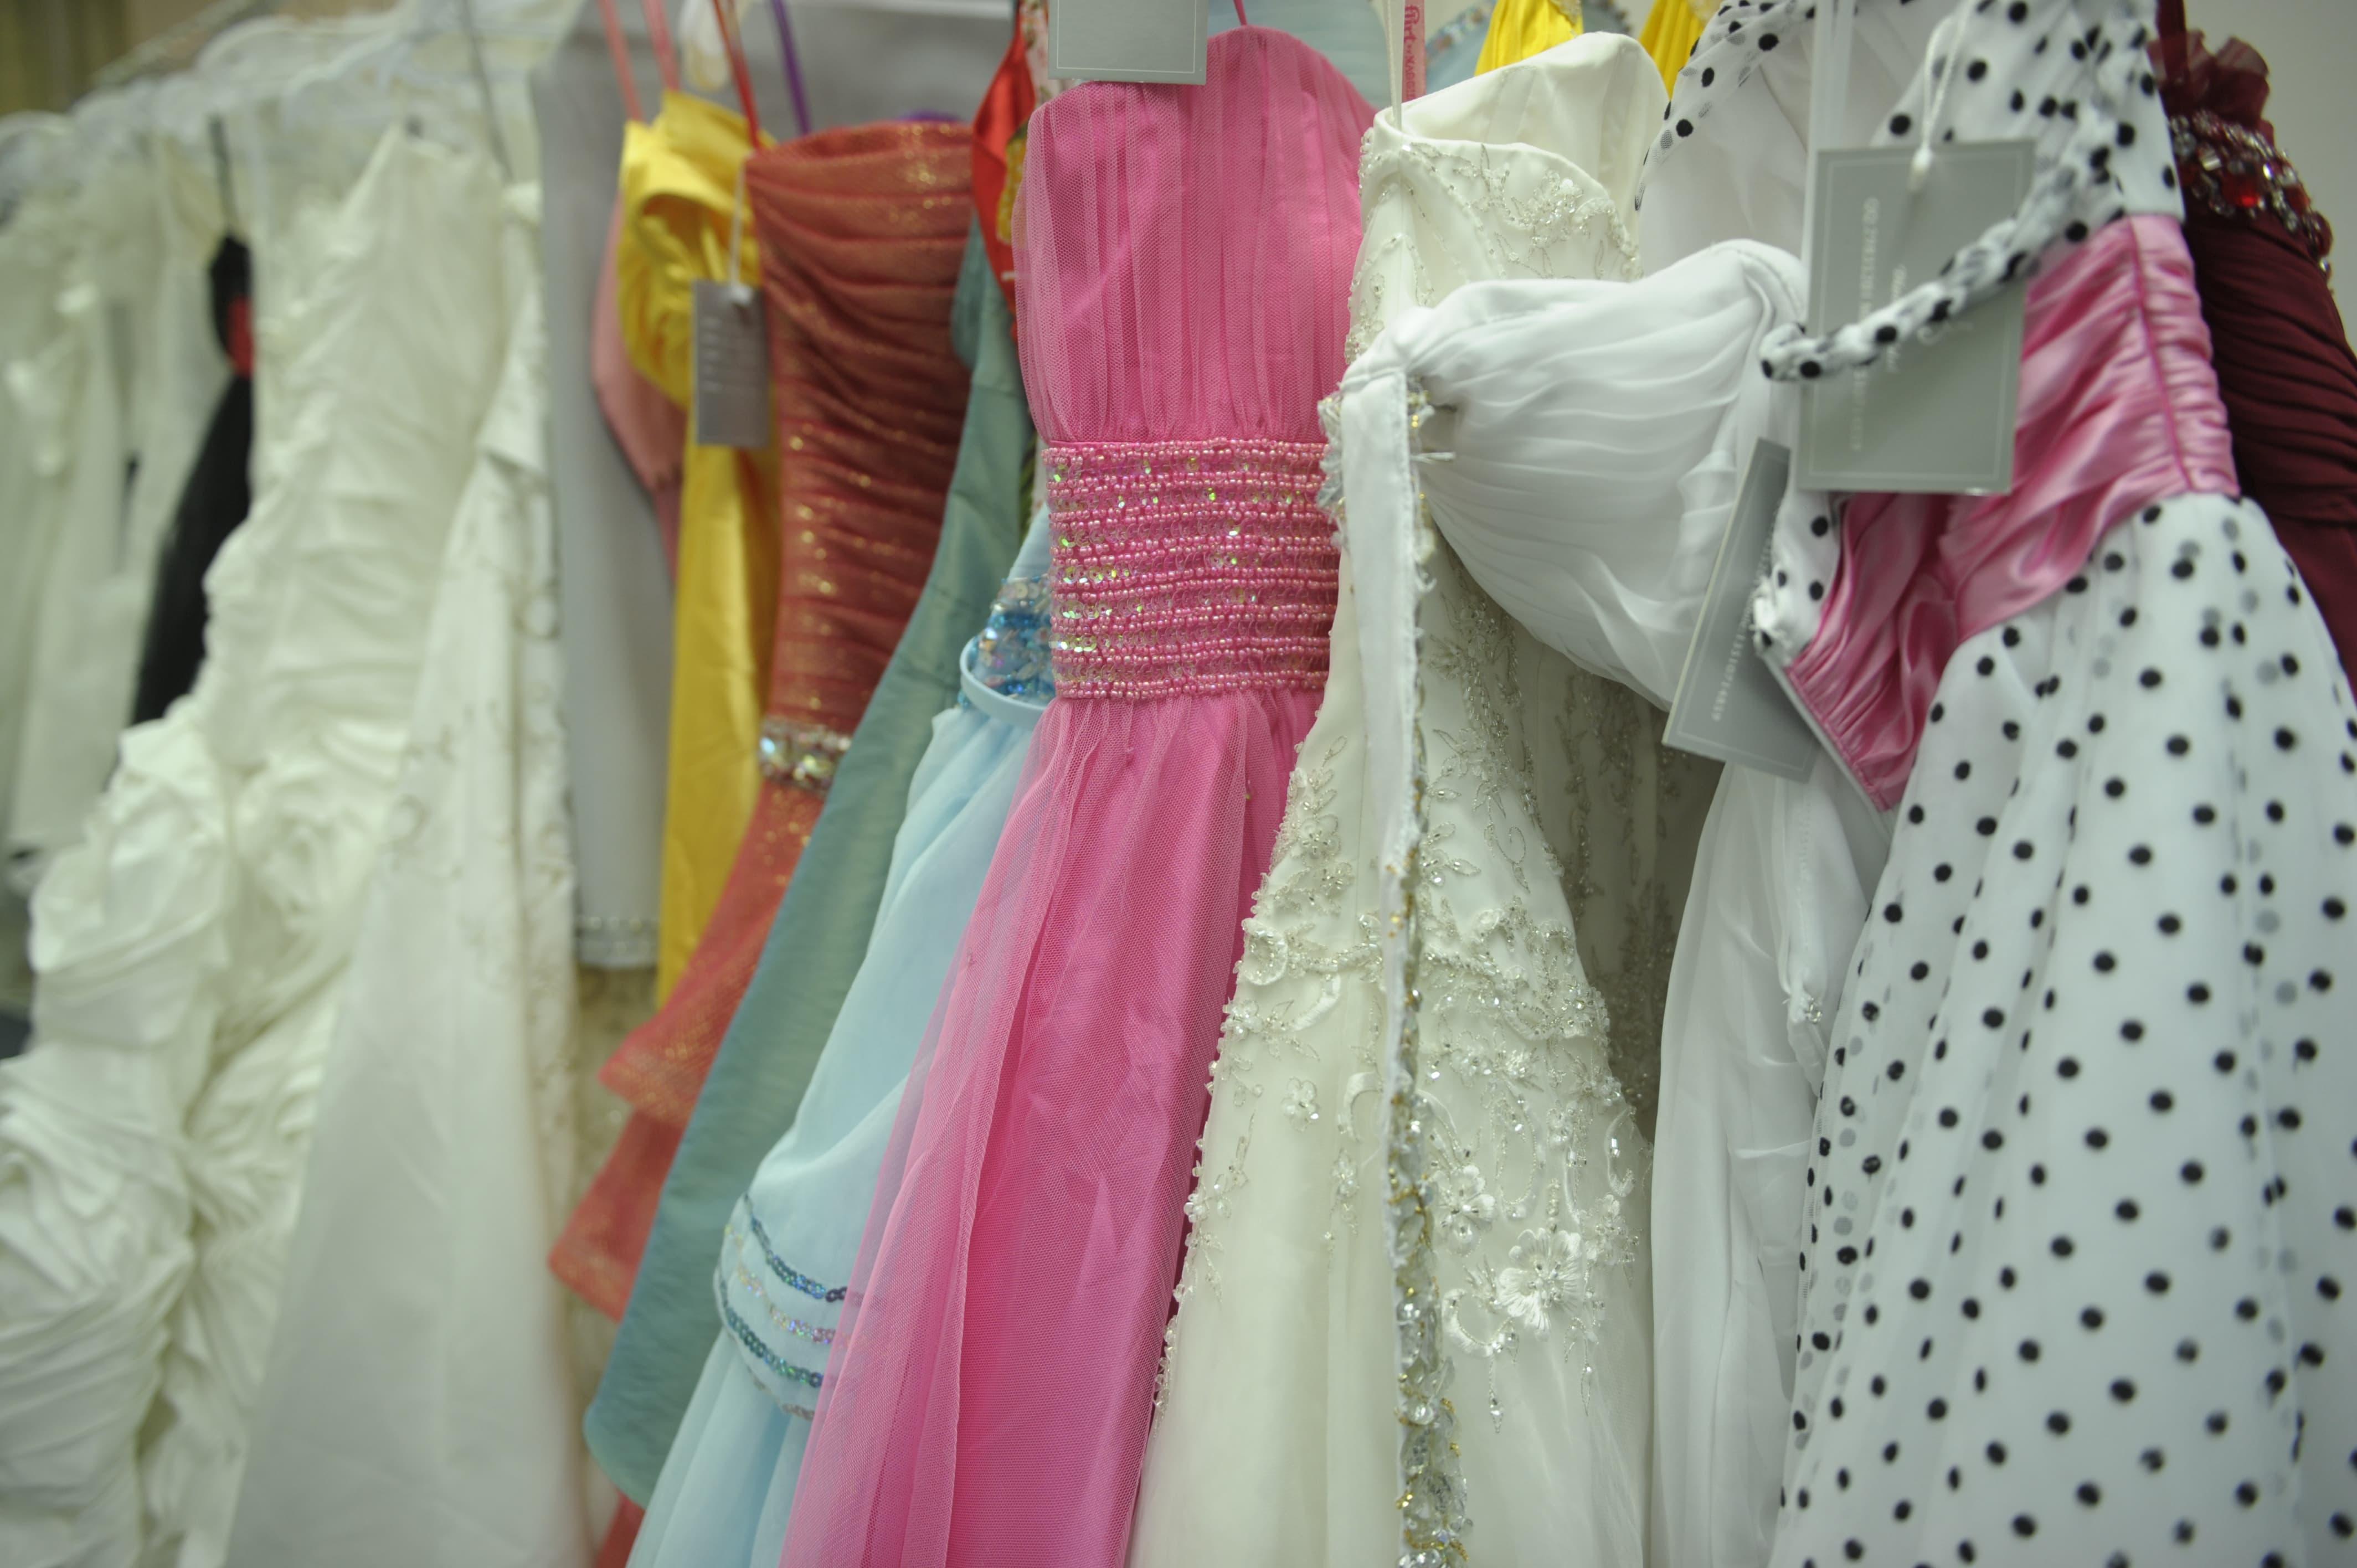 Bridal Shop Owner Says U.S.-China Tariffs Will Hurt His Business ...